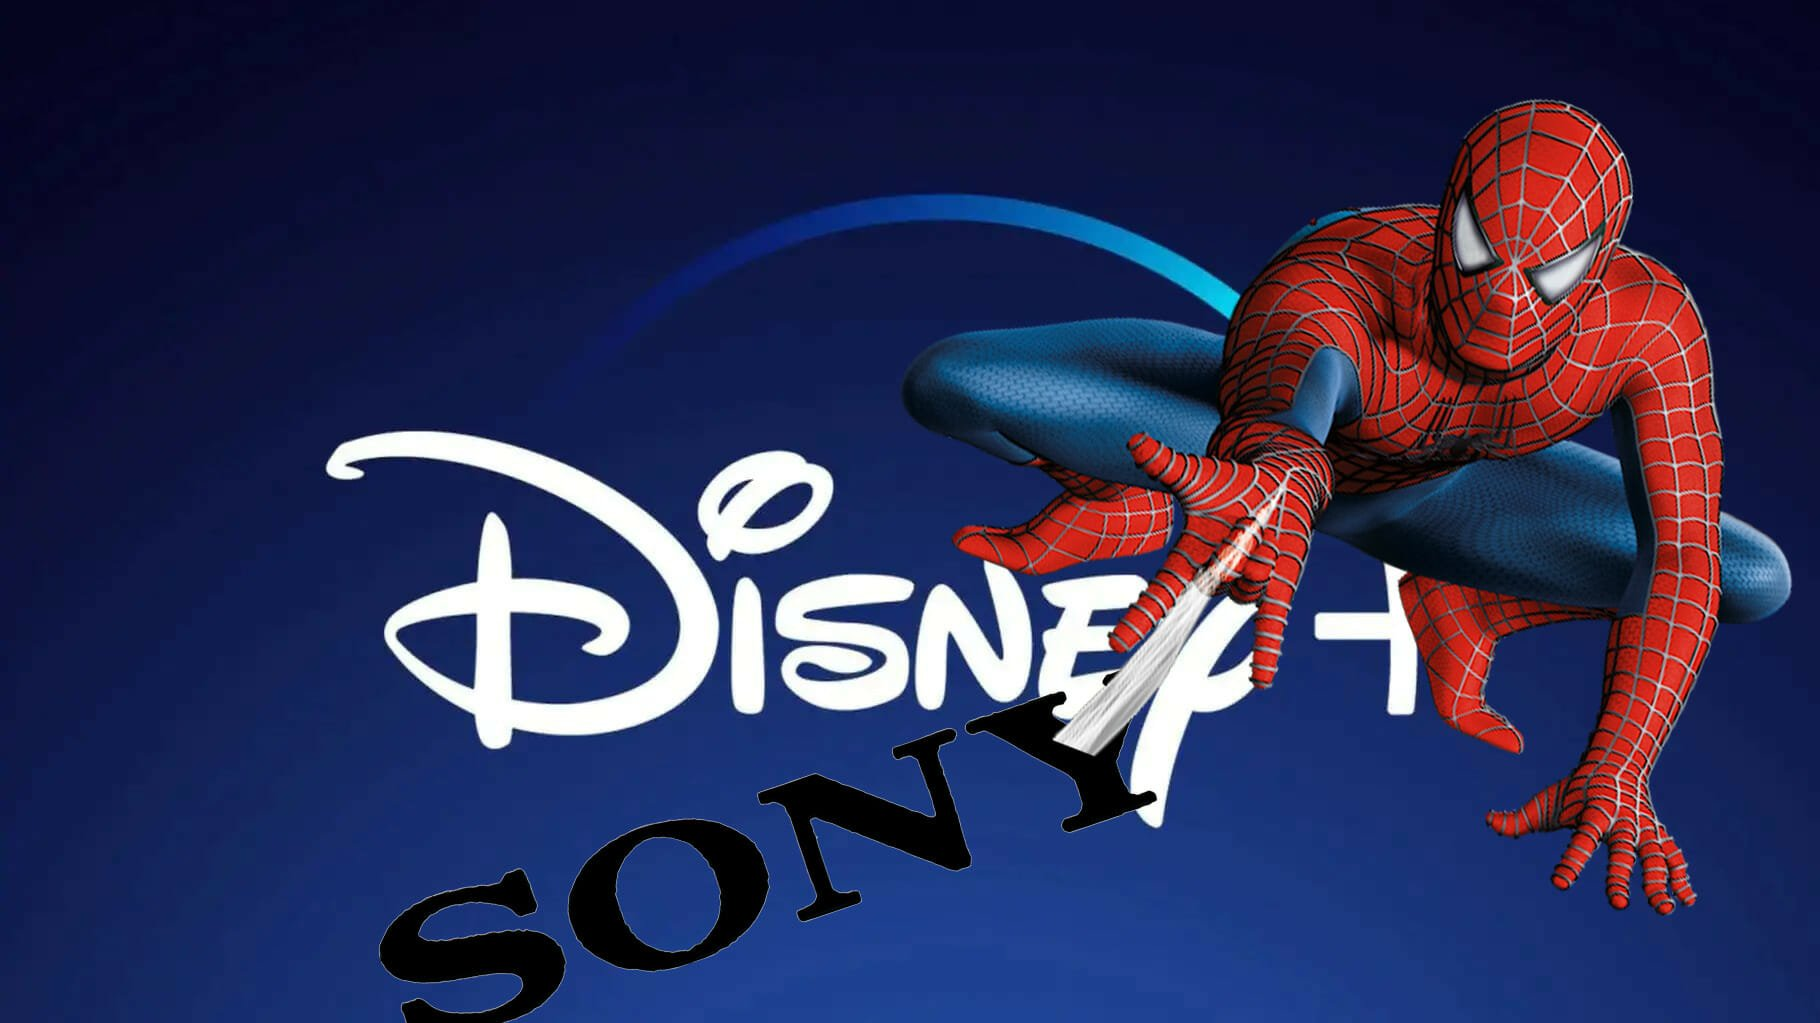 Spider-Man on Sony and Disney Plus Logos